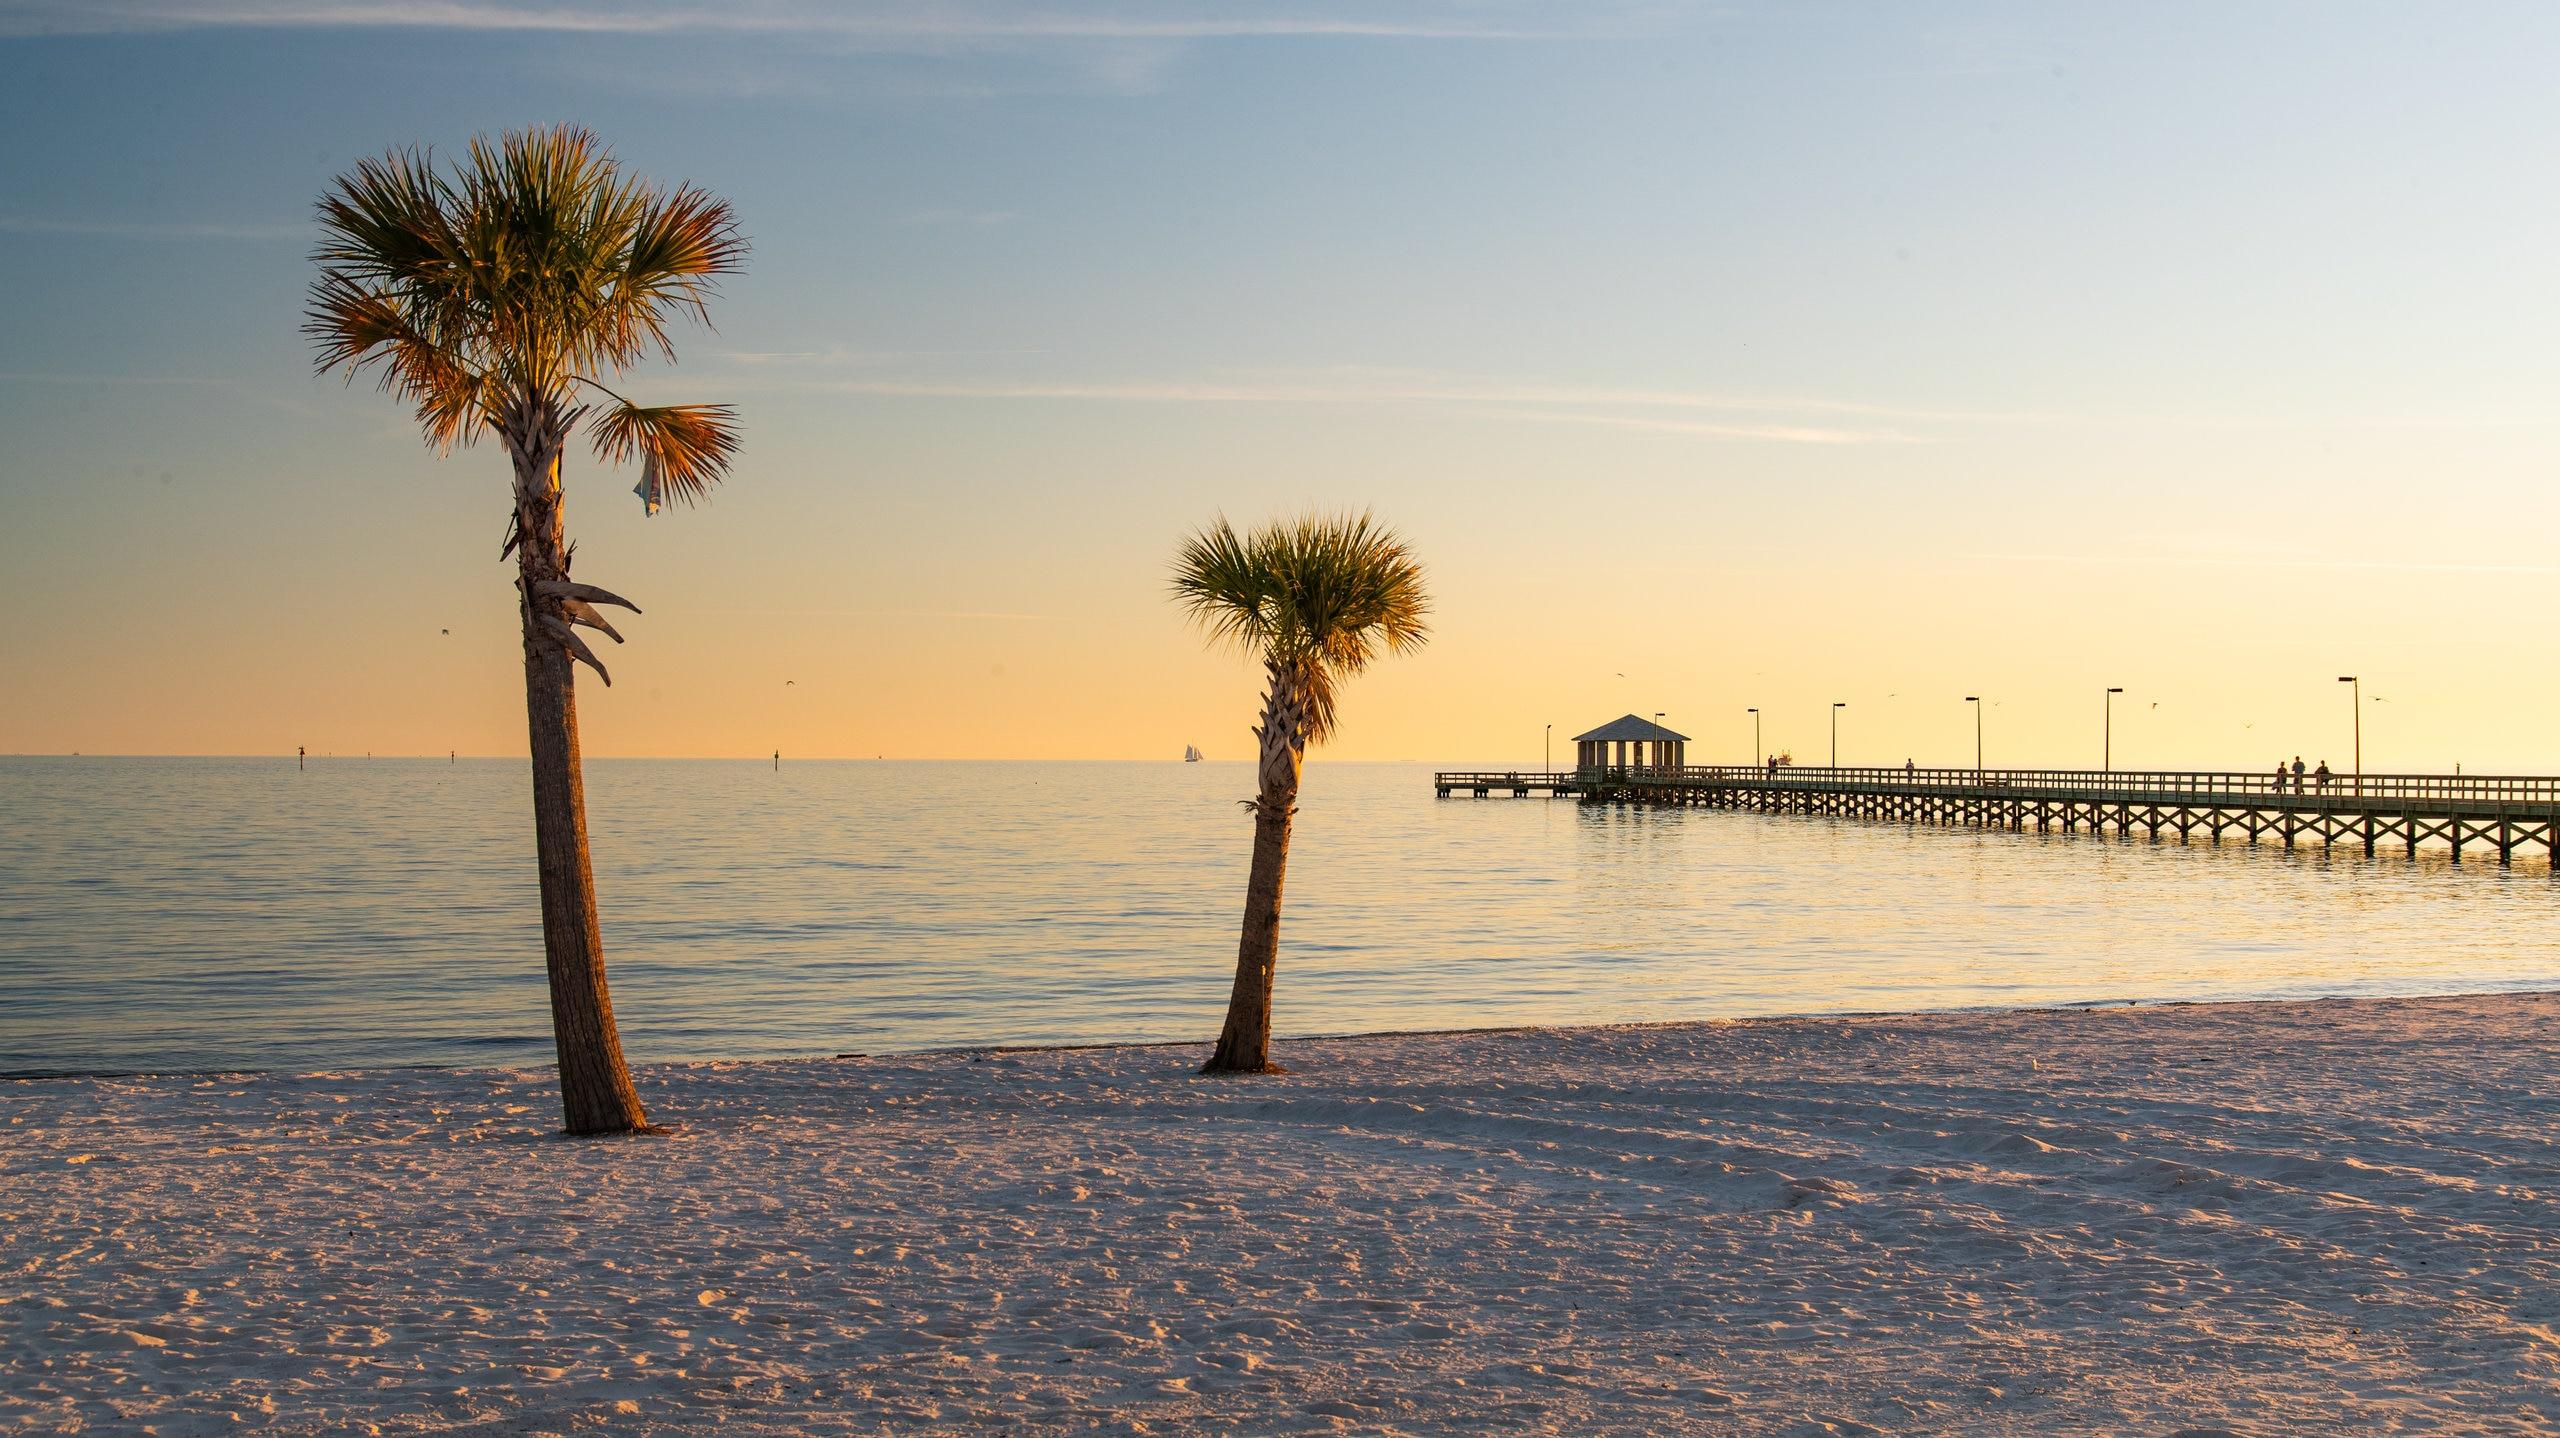 Biloxi Beach, Biloxi, Mississippi, United States of America